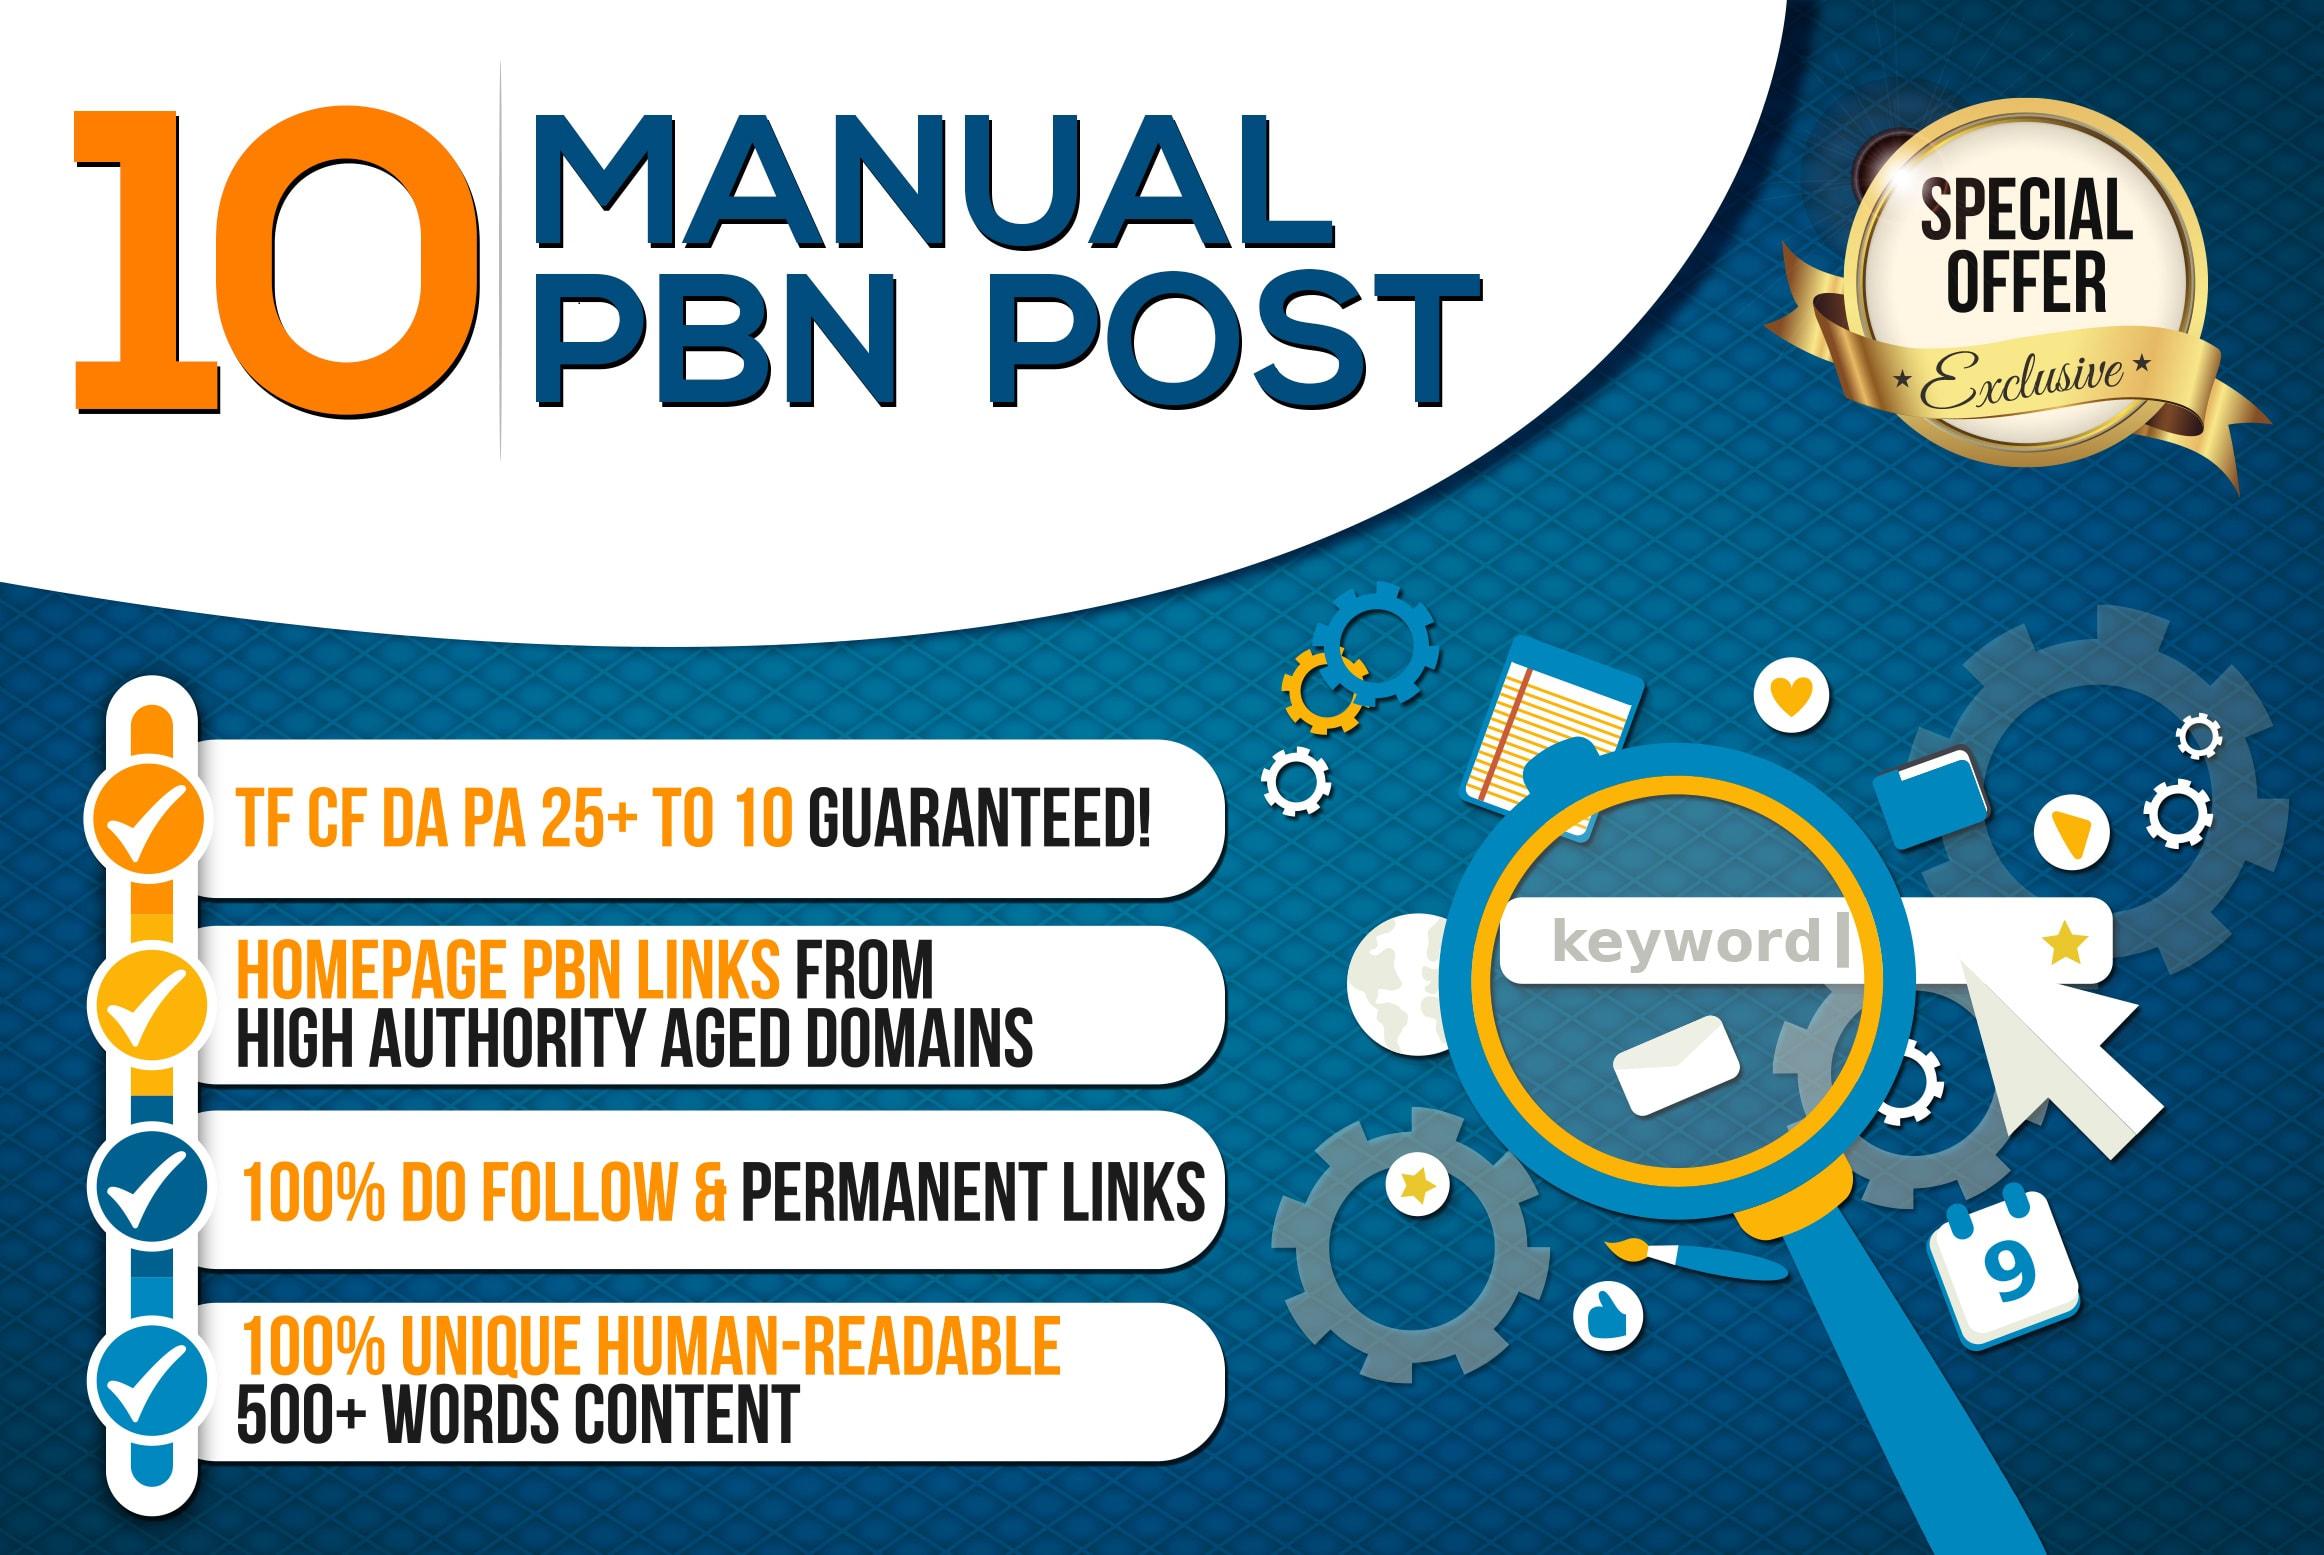 build 10 Manual High Trustflow Dofollow Homepage PBN Backlinks